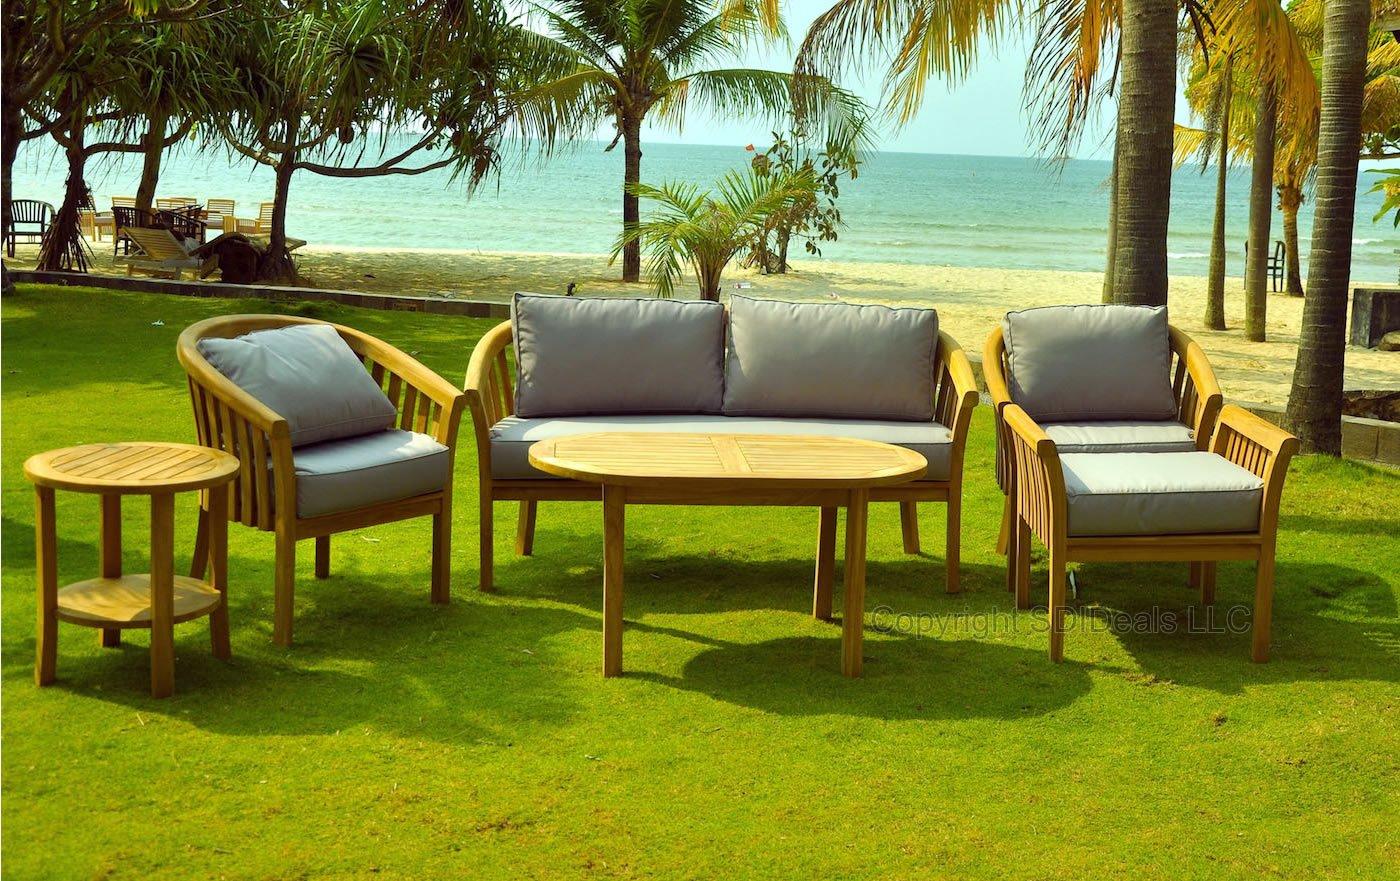 6 Piece Round Back Teak Indonesian Outdoor Patio Chair Set